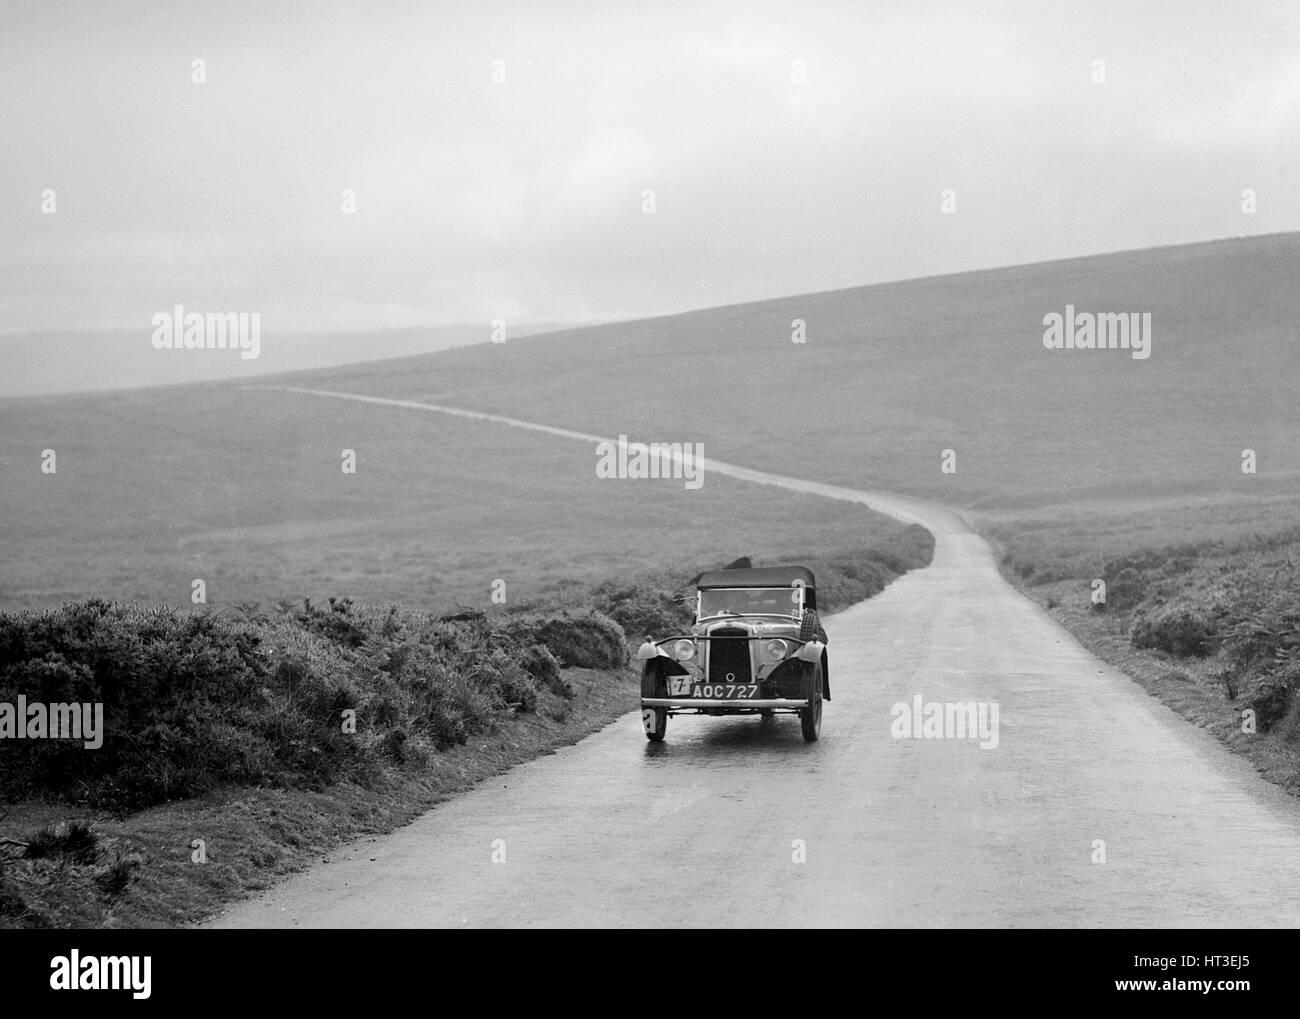 BSA 3 wheeler of EF Cope, winner of a premier award at the MCC Torquay Rally, July 1937. Artist: Bill Brunell. - Stock Image